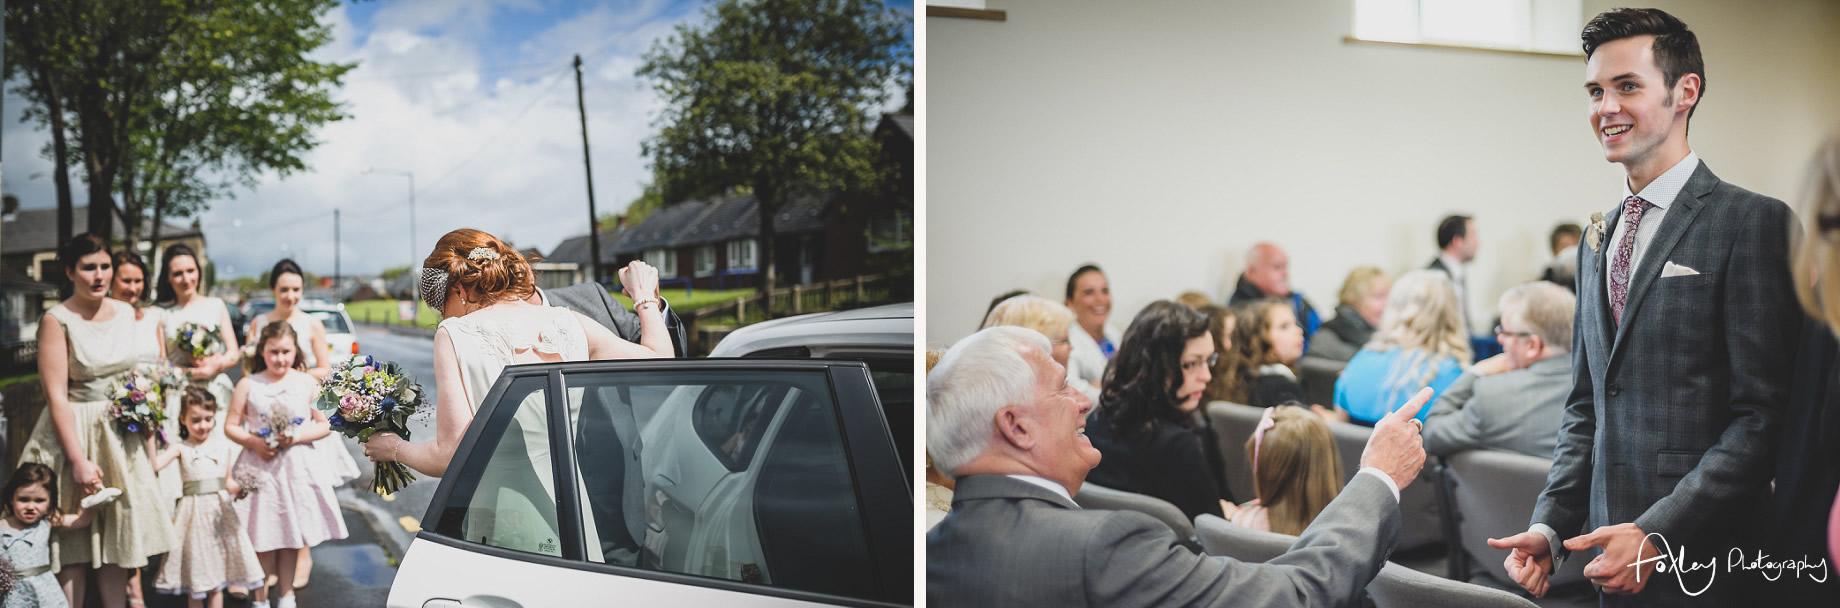 Mel-and-Lewis-Wedding-at-Barley-Village-Hall-077